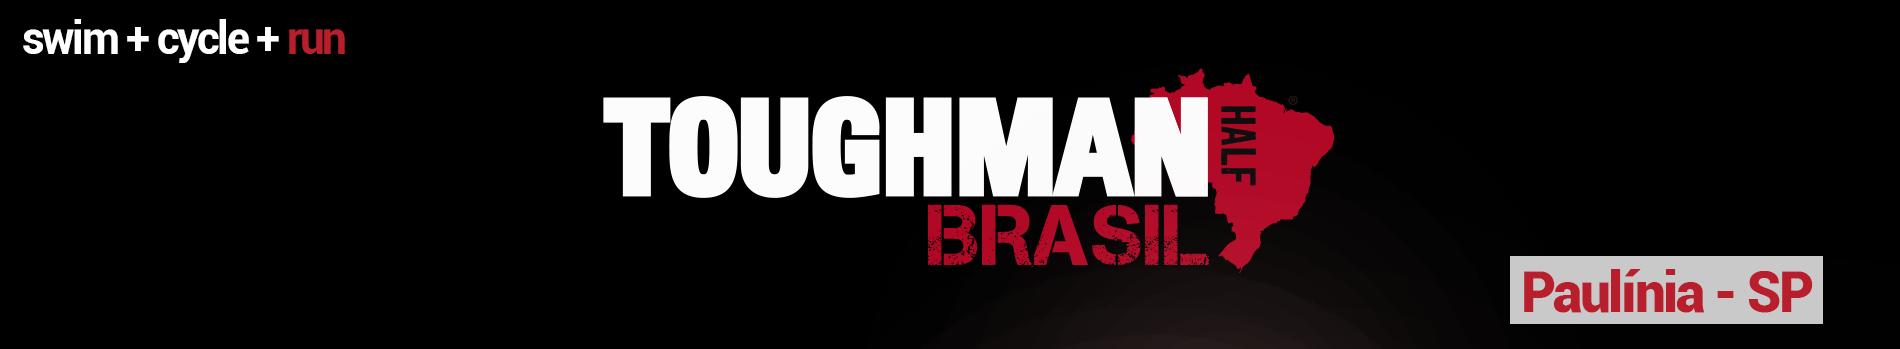 TOUGHMAN BRASIL 2018 - Imagem de topo